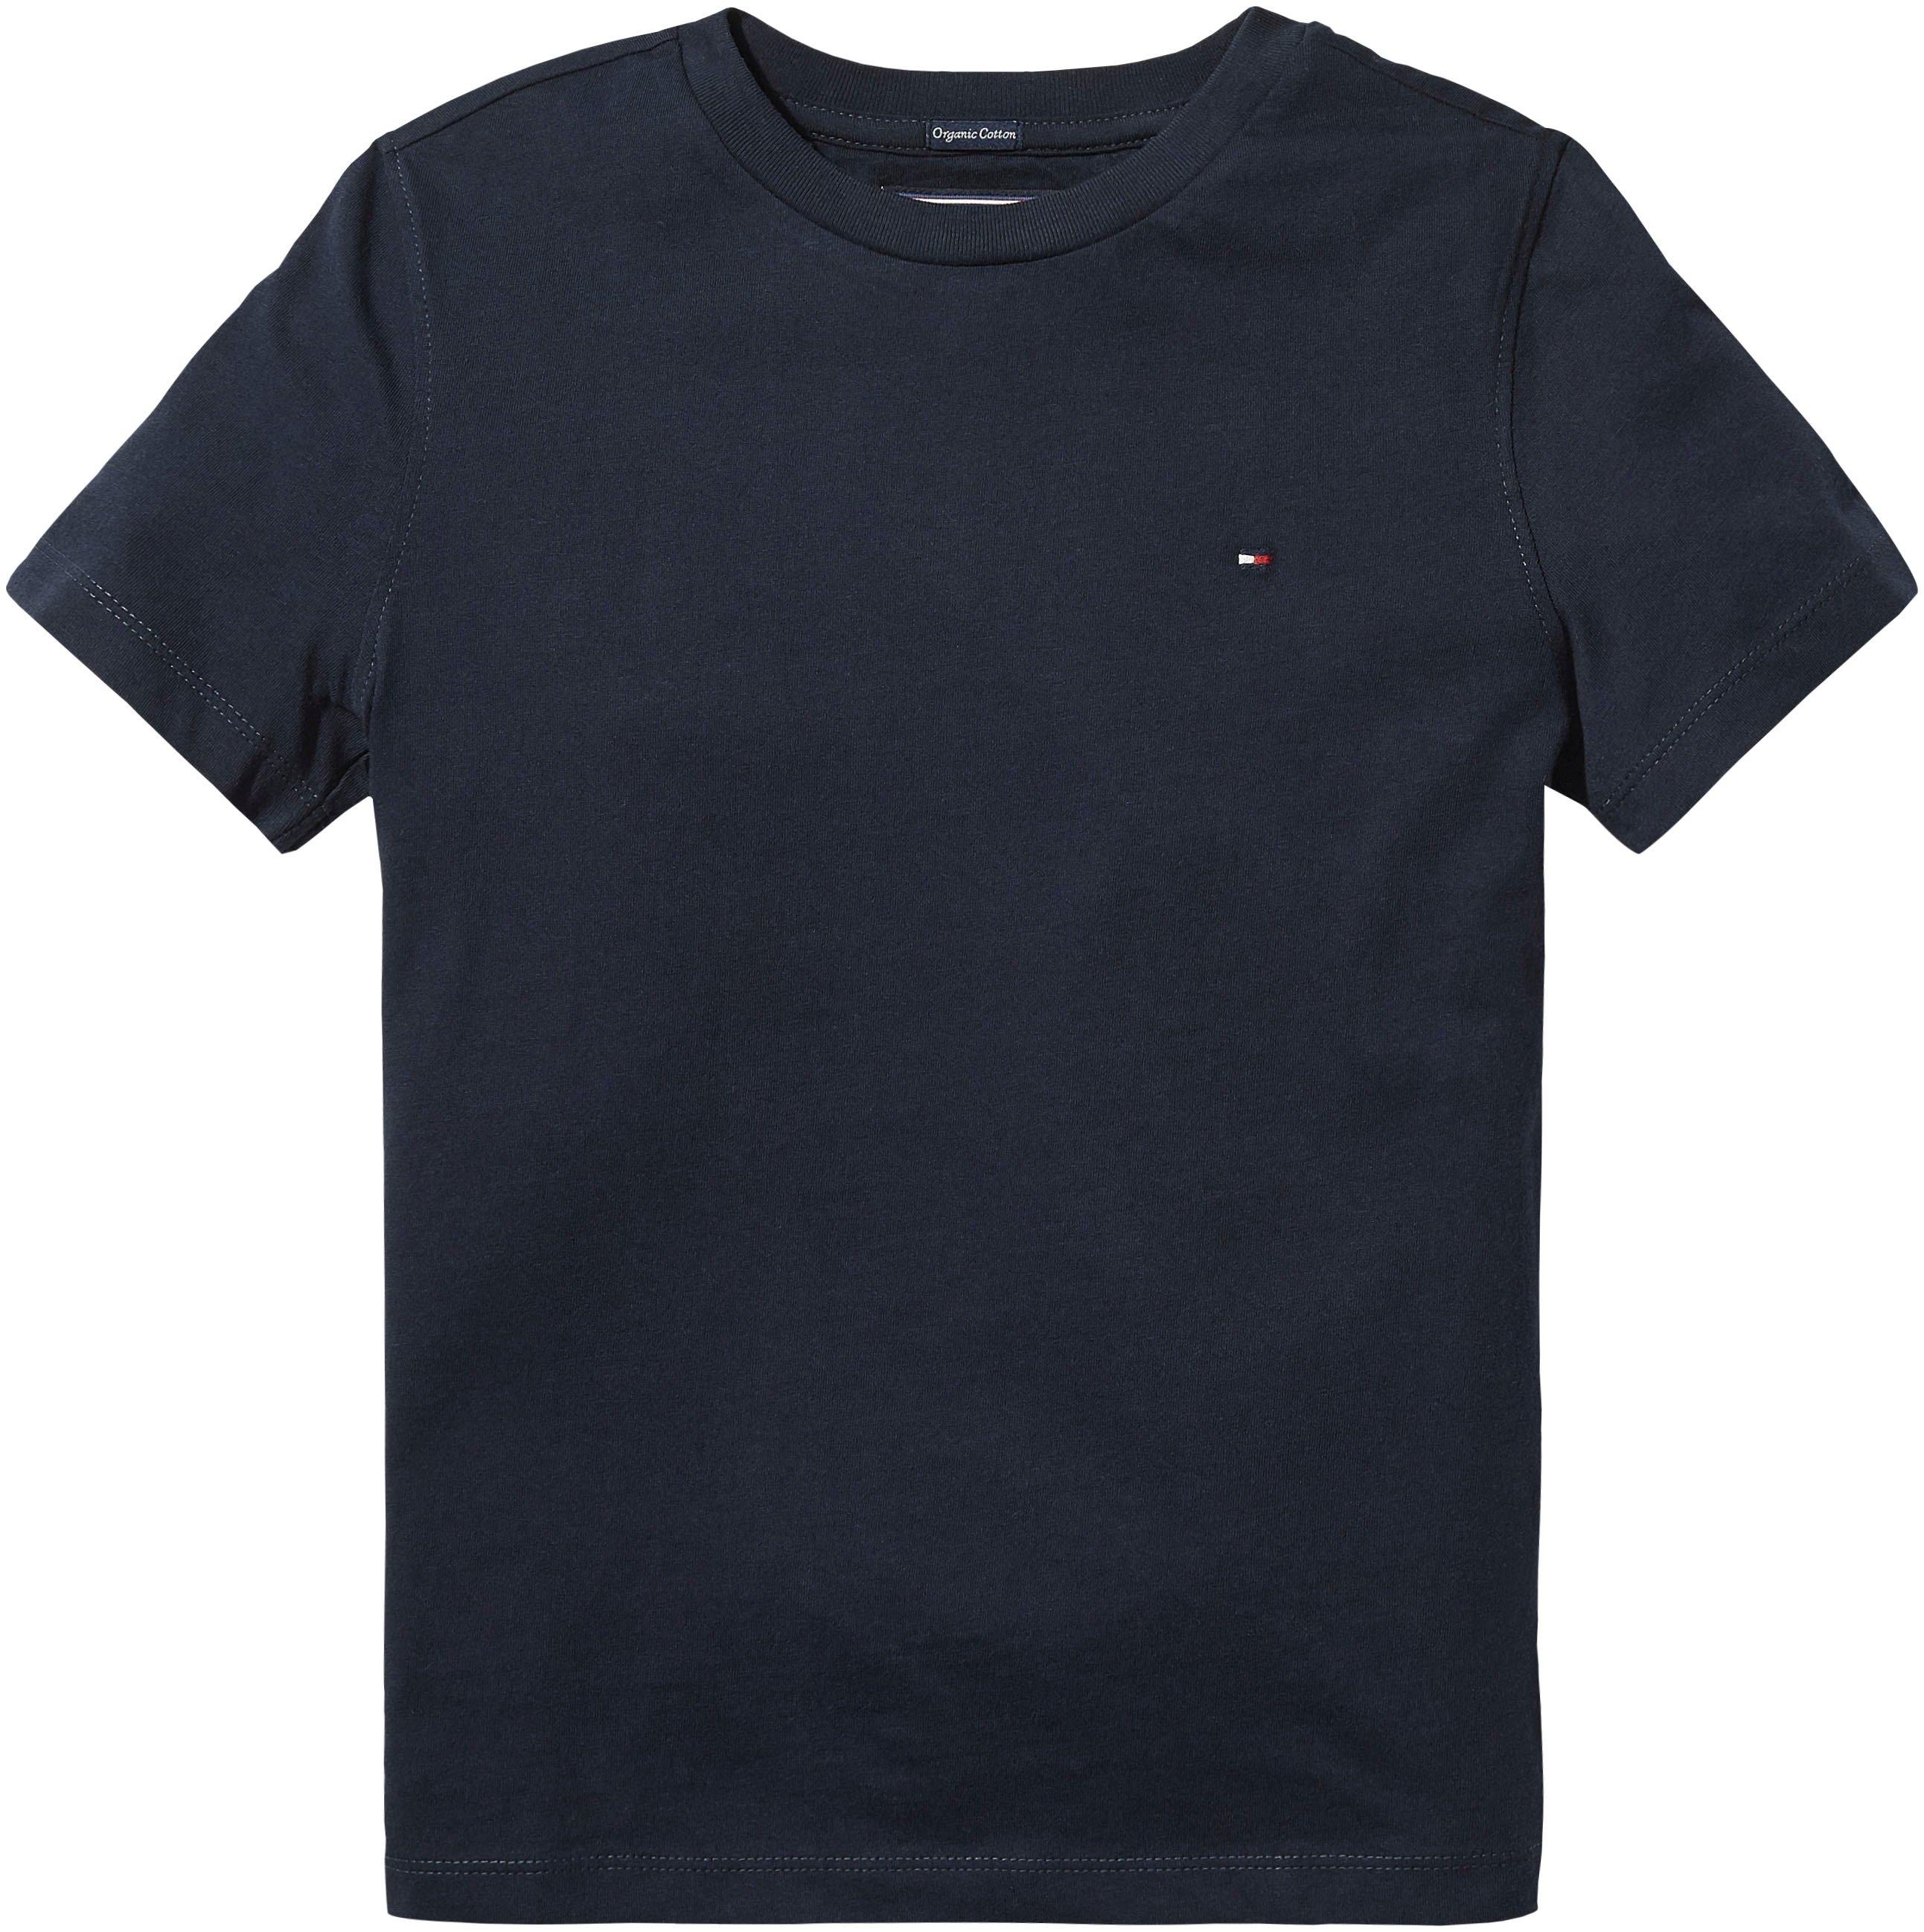 Tommy Hilfiger T-shirt bestellen: 30 dagen bedenktijd